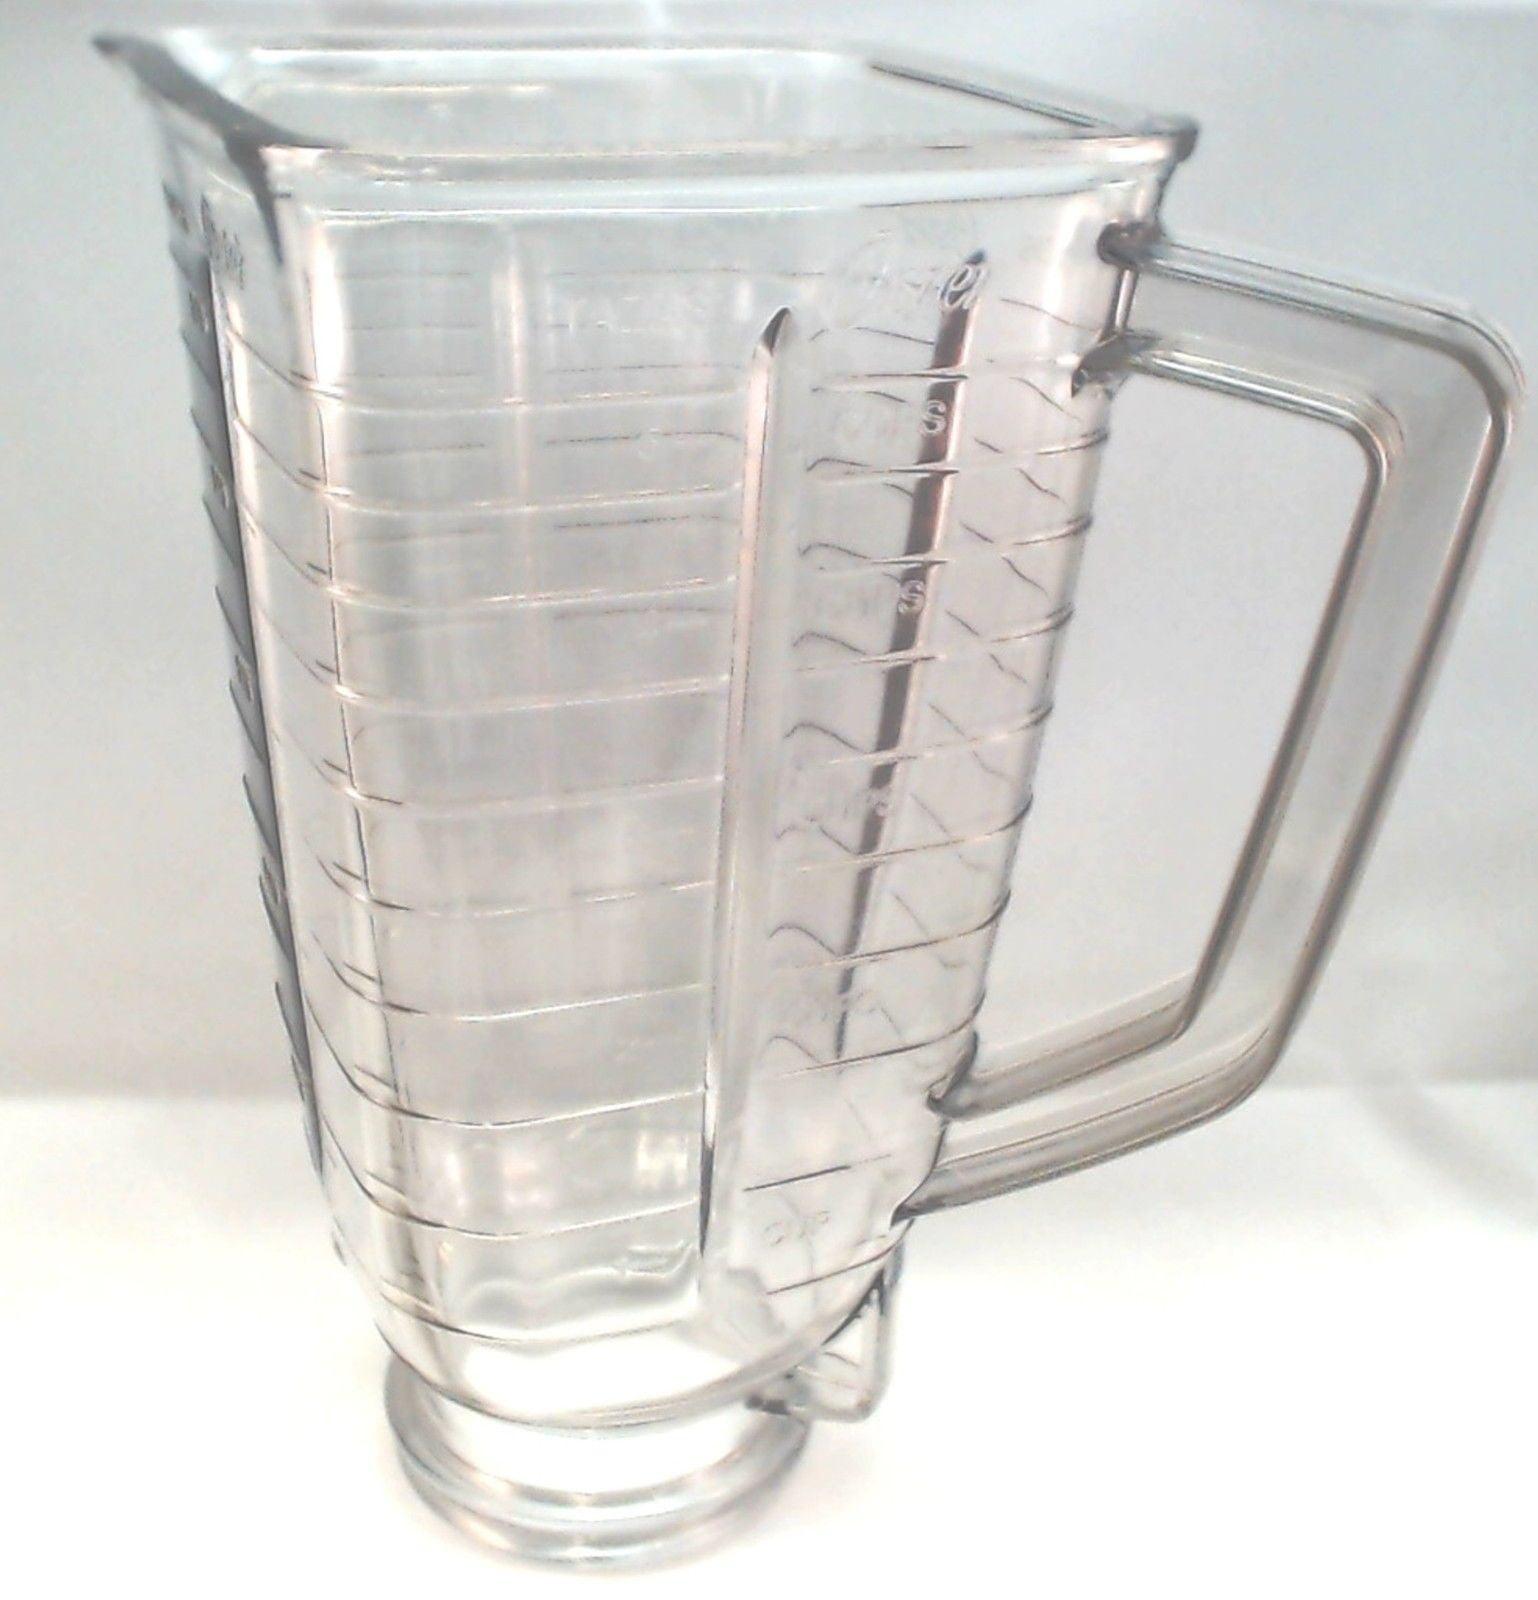 Sunbeam / Oster Blender Jar, Square Top Plastic, 027472-000-089